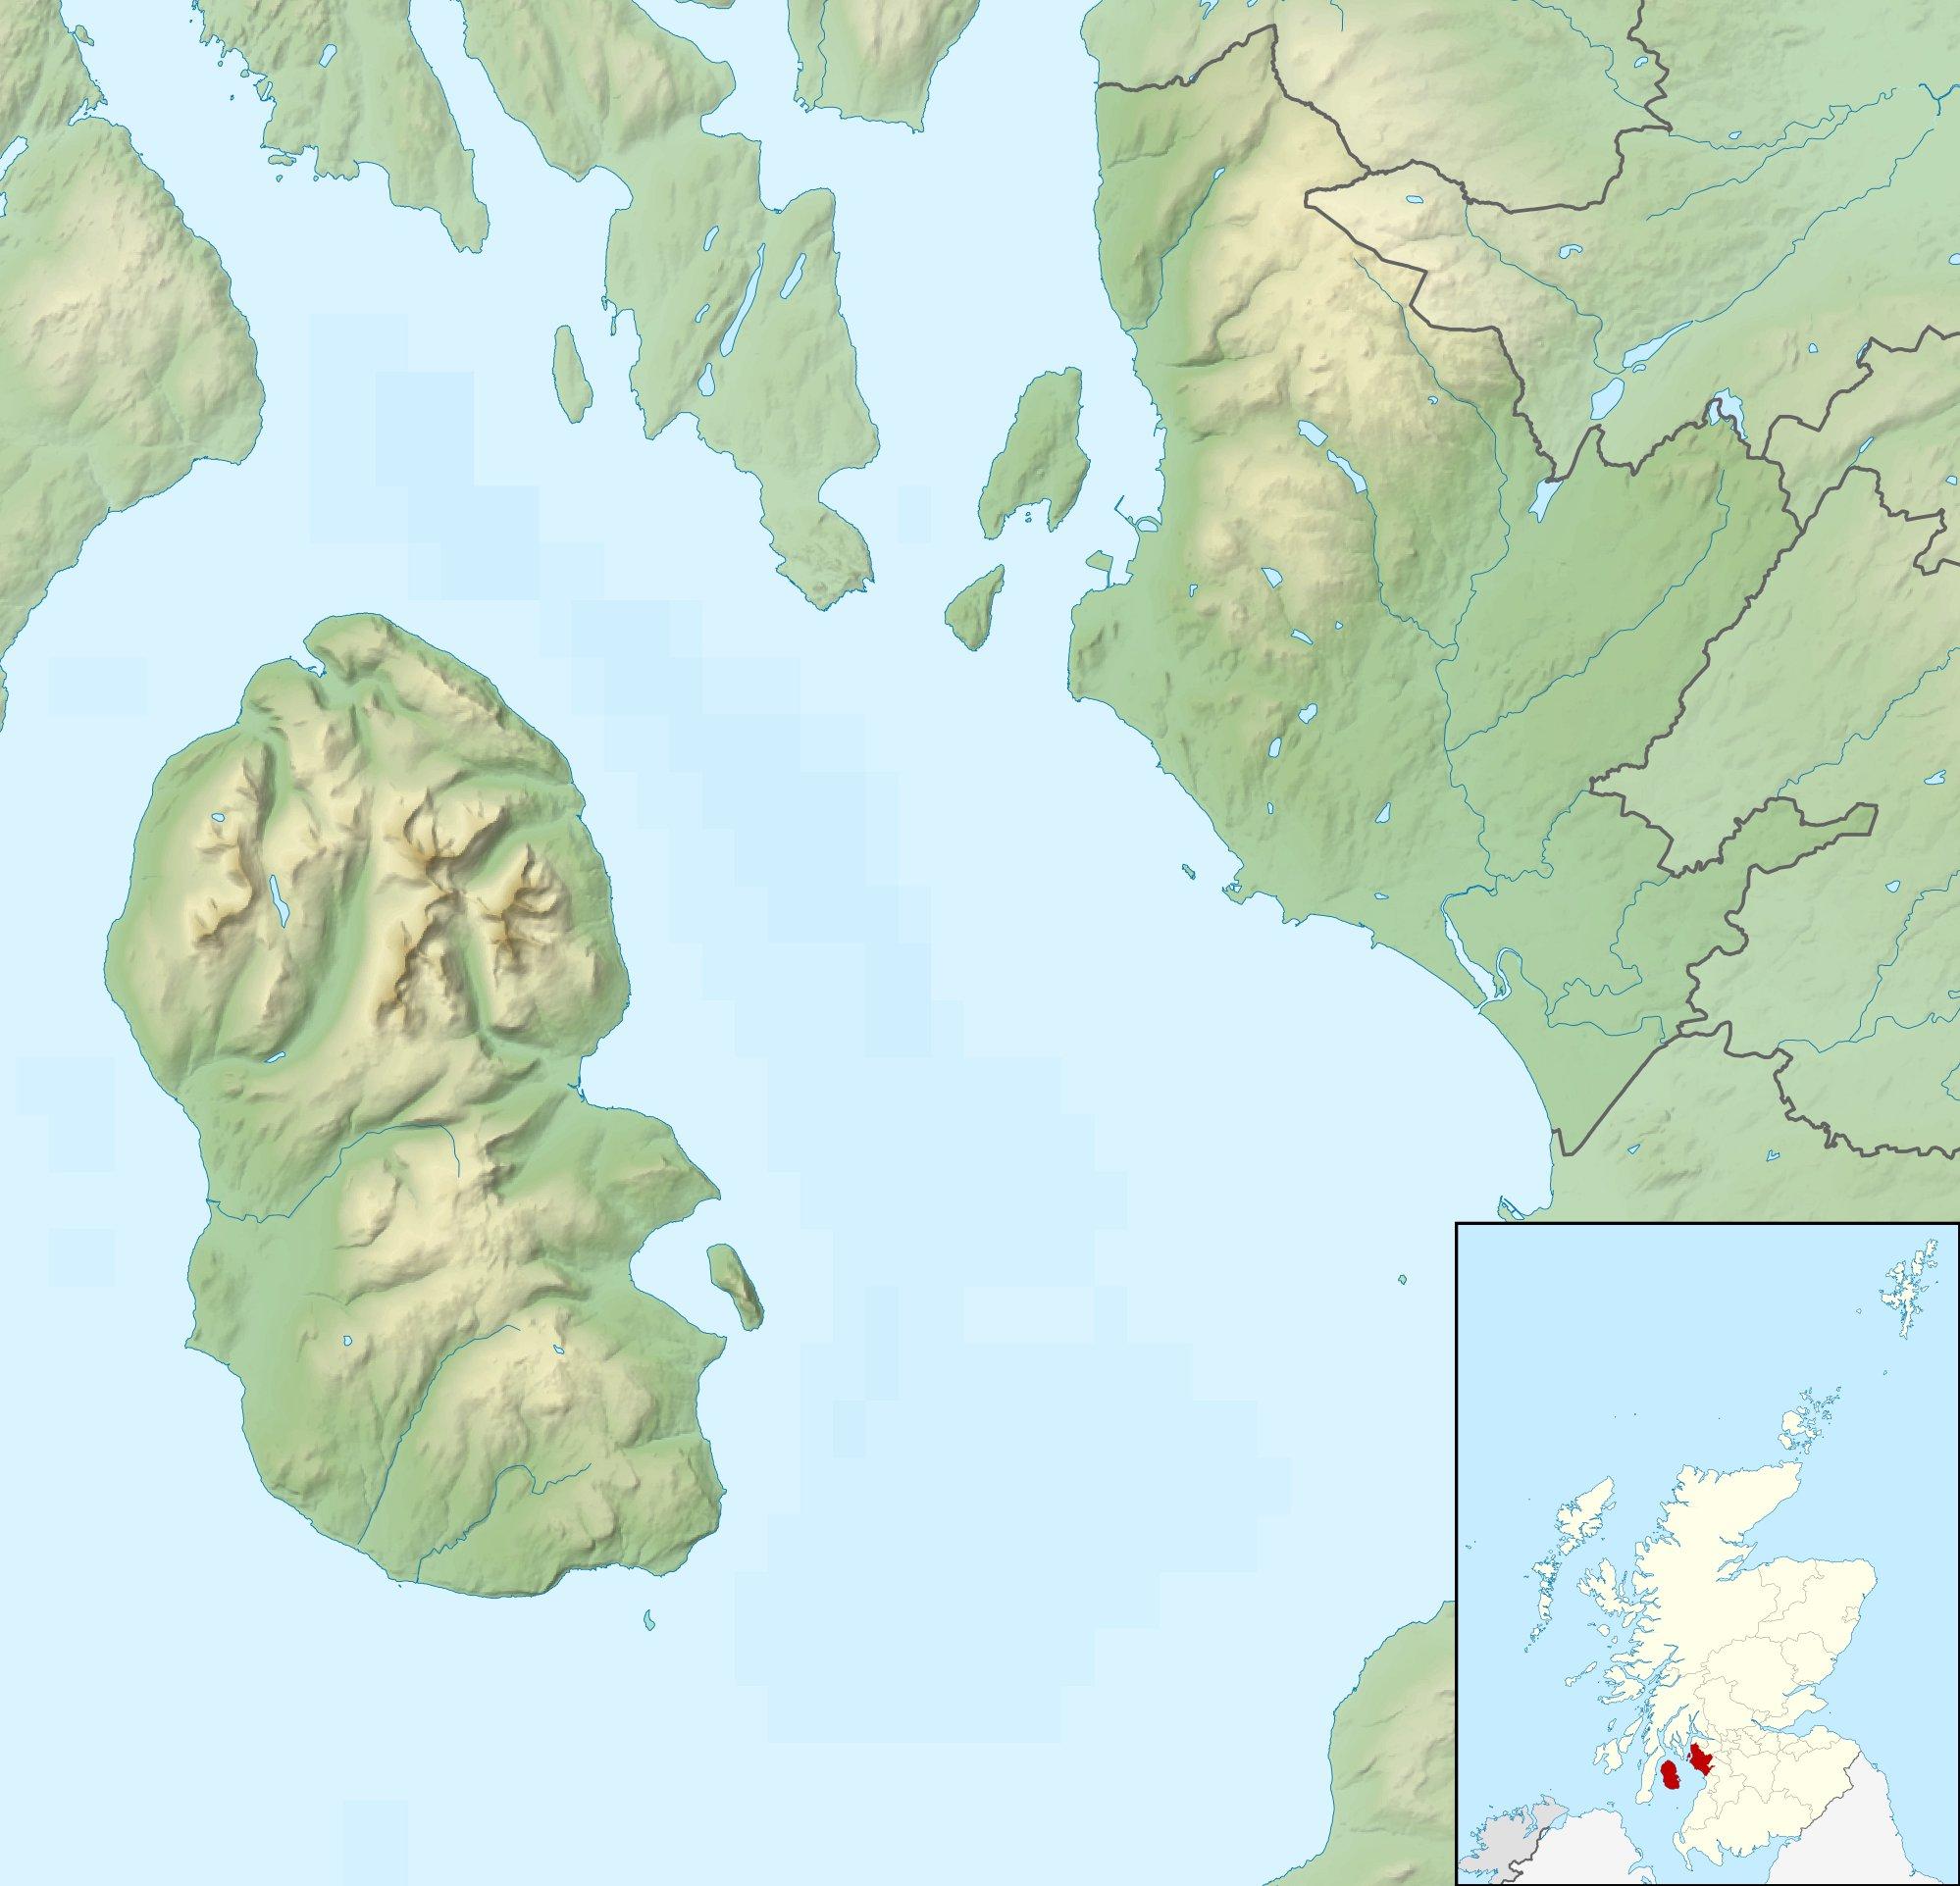 Pohjois-Ayrshire dating